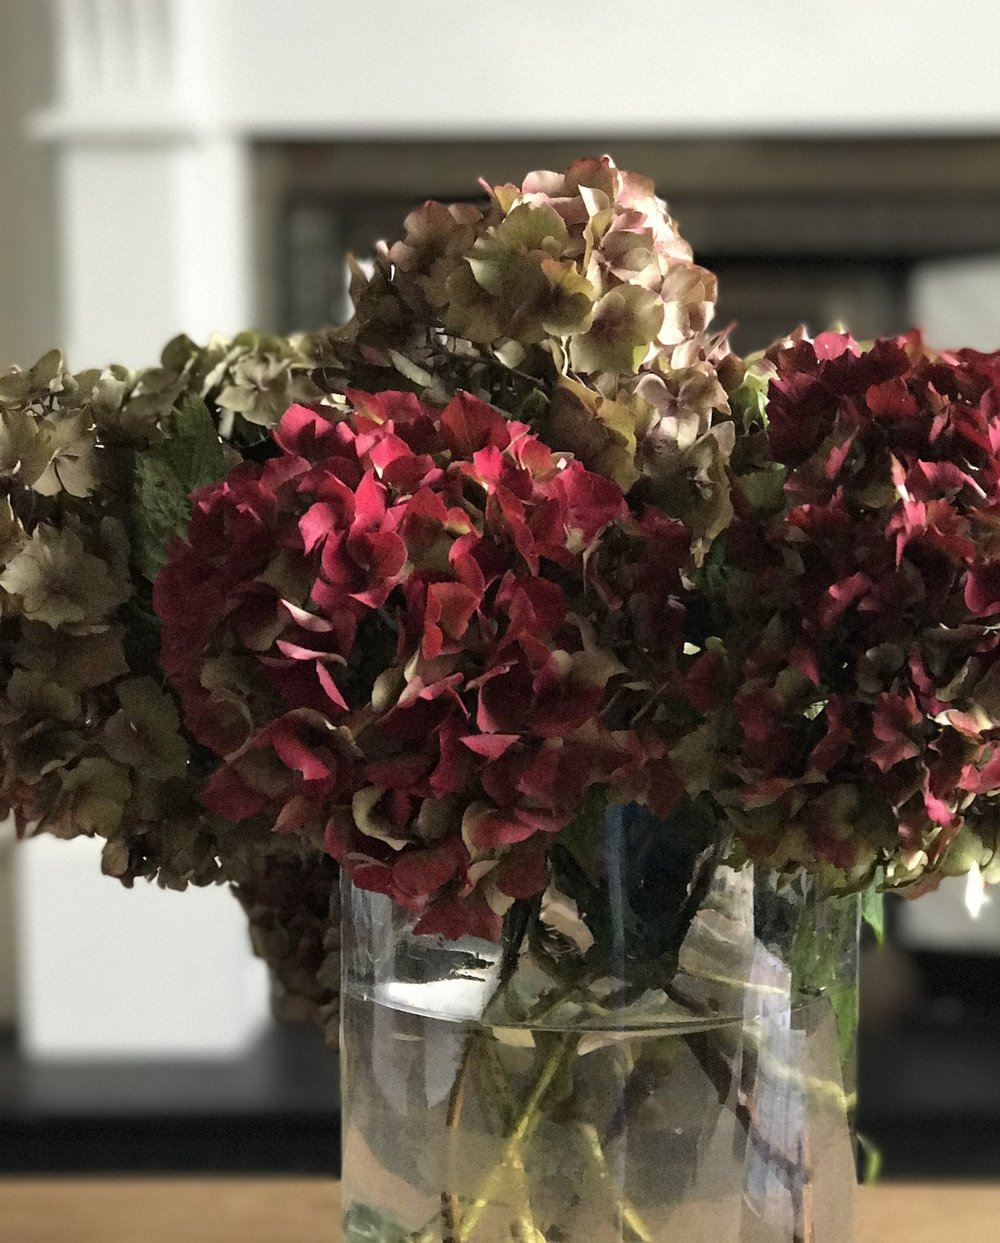 Gorgeous Hydrangeas given to me at the EKBB Awards this week.